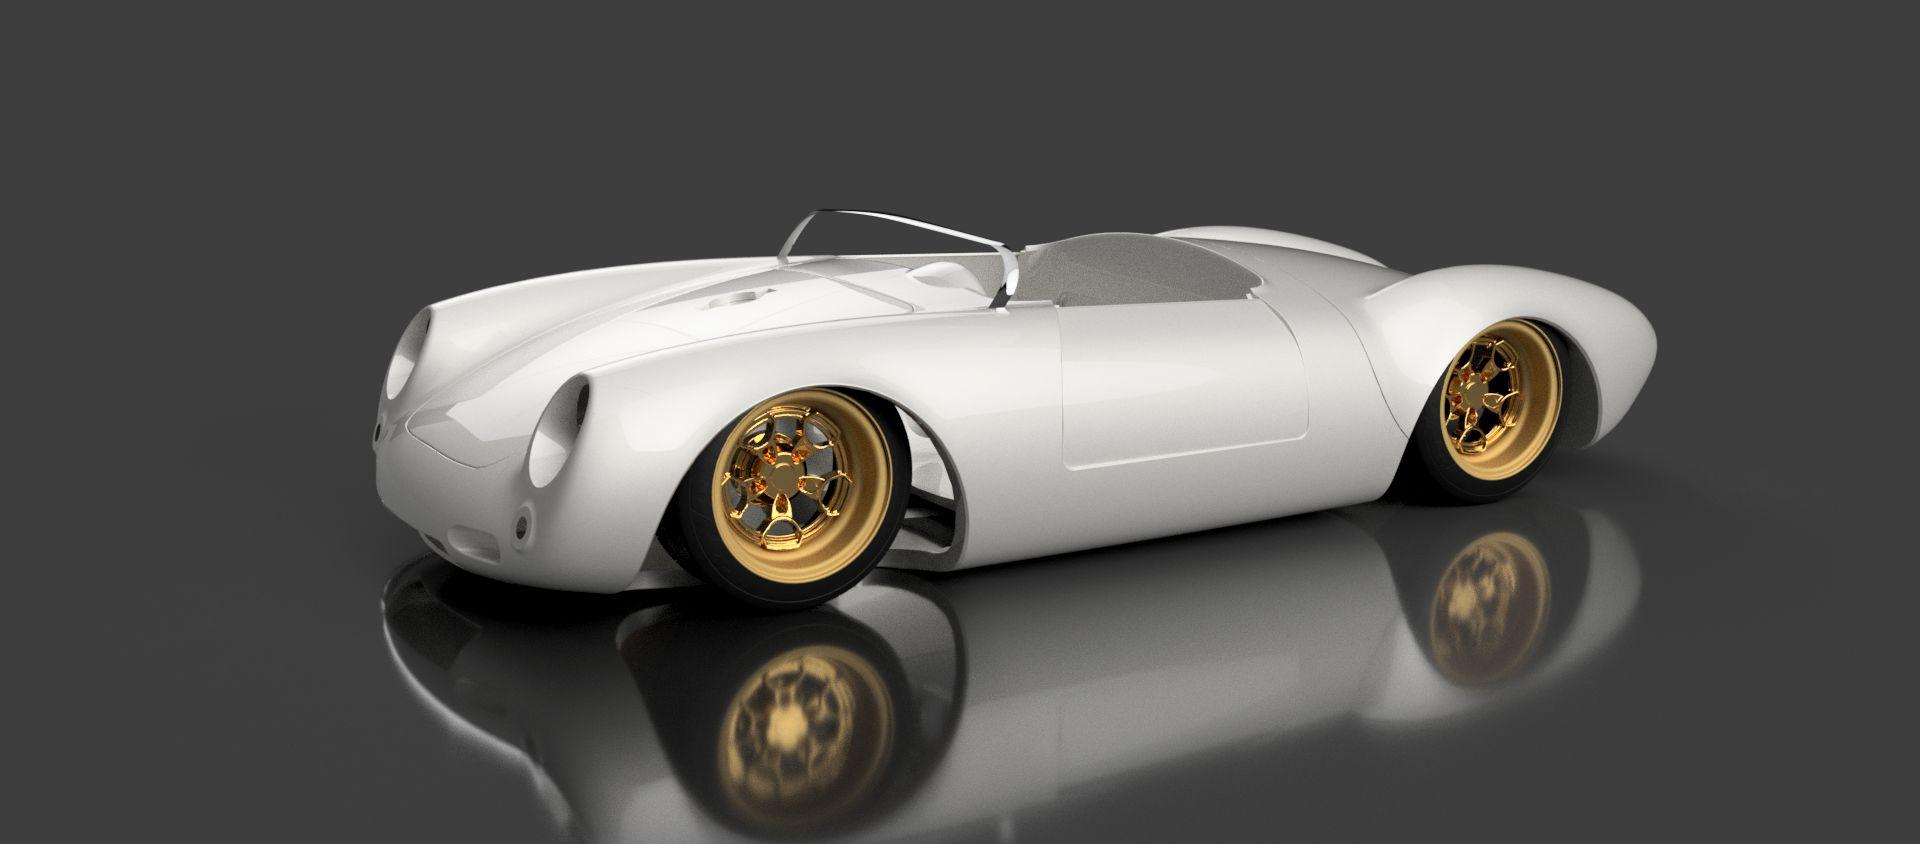 Porsche-550-spyder-v2-3500-3500